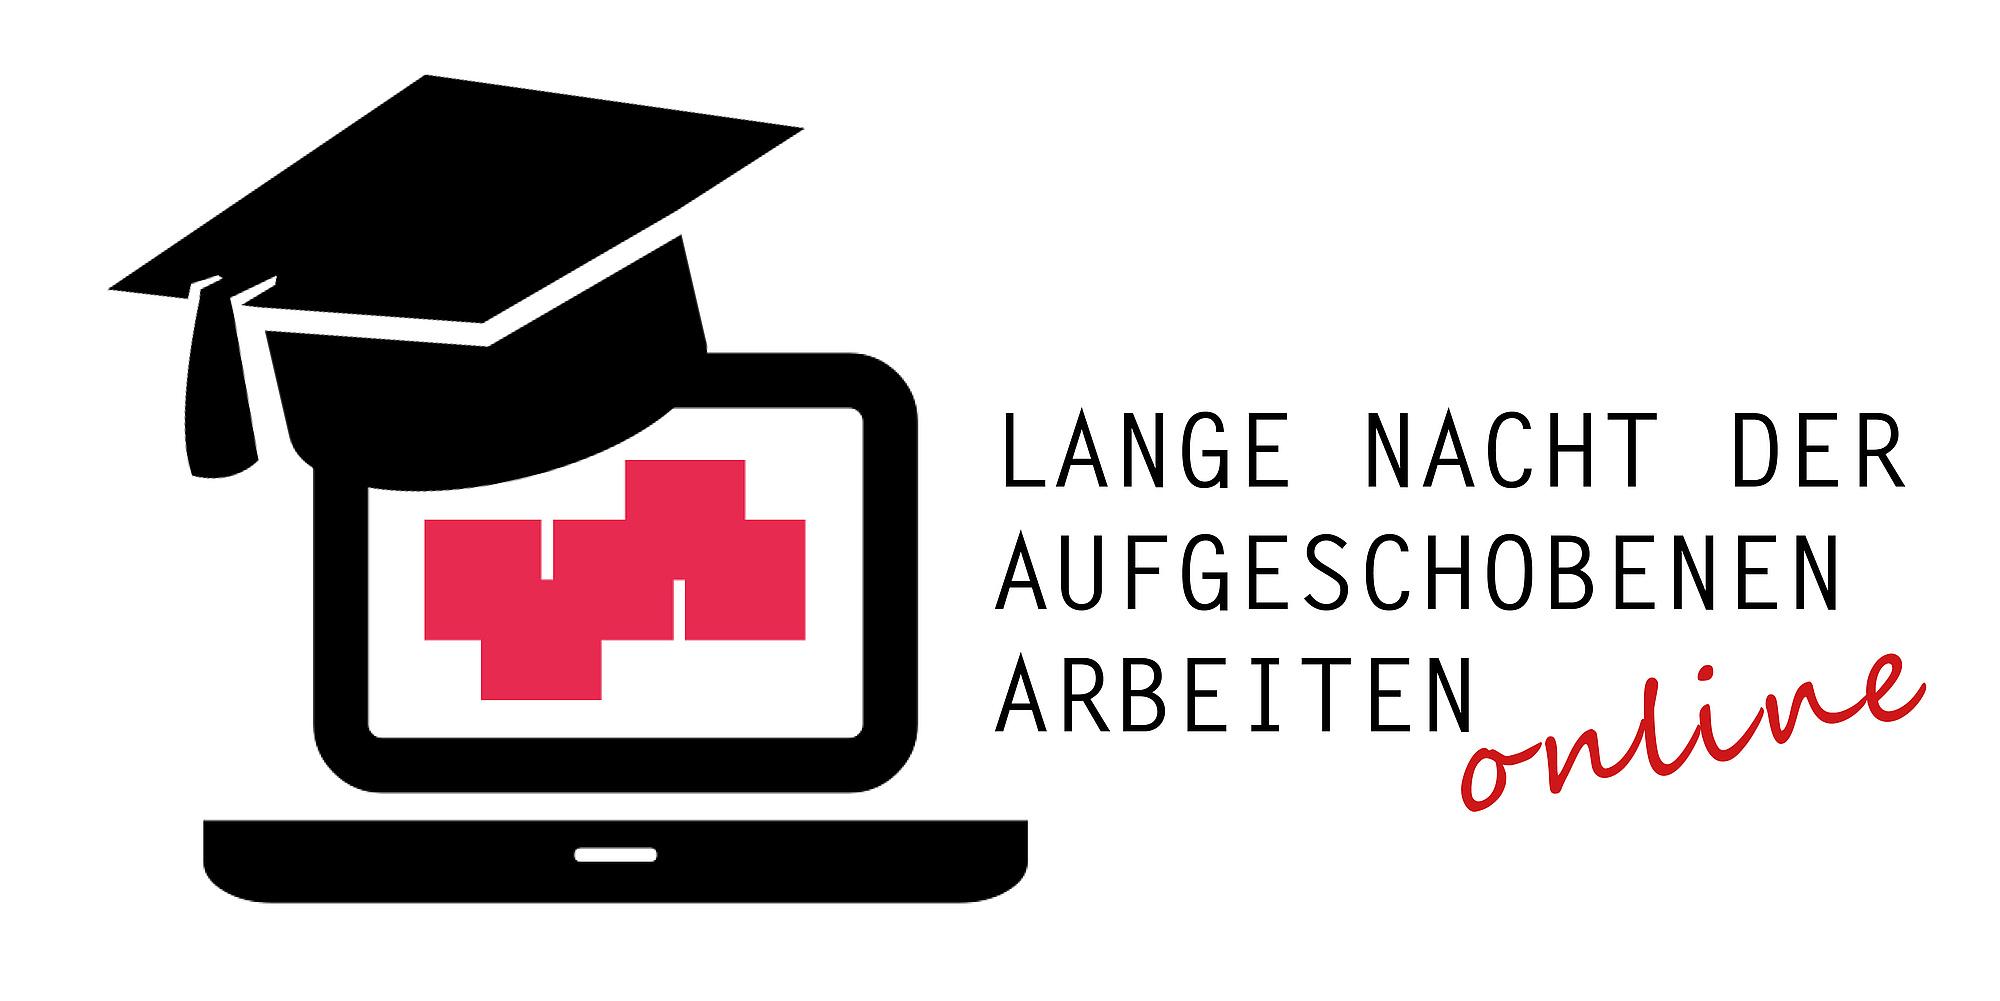 Notebook and graduation cap. Text: Lange Nacht der aufgeschobenen Arbeiten online.